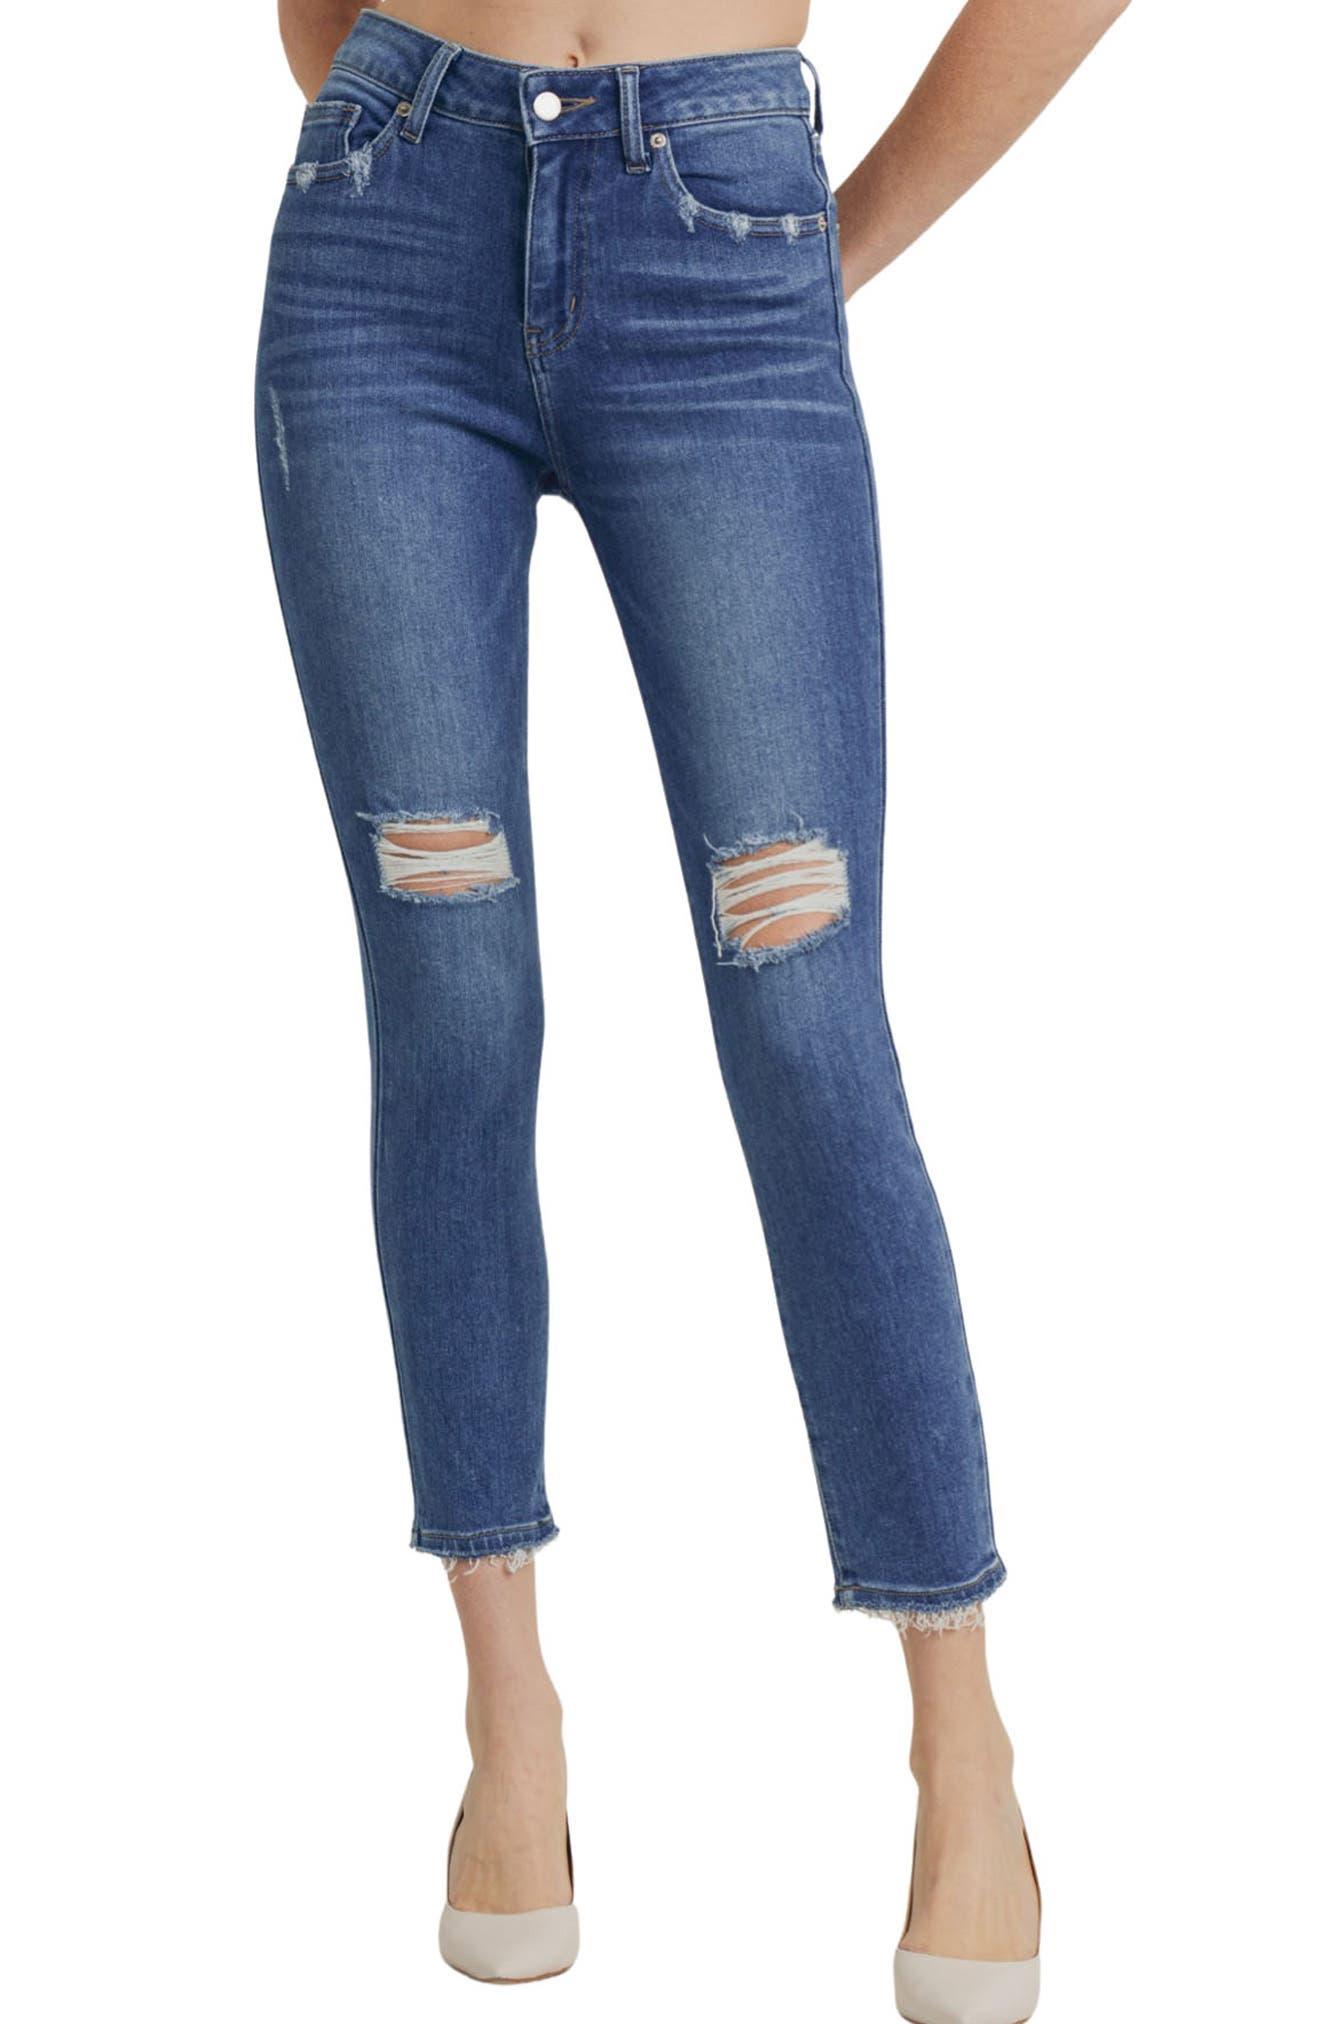 Verona Ripped High Waist Ankle Skinny Jeans